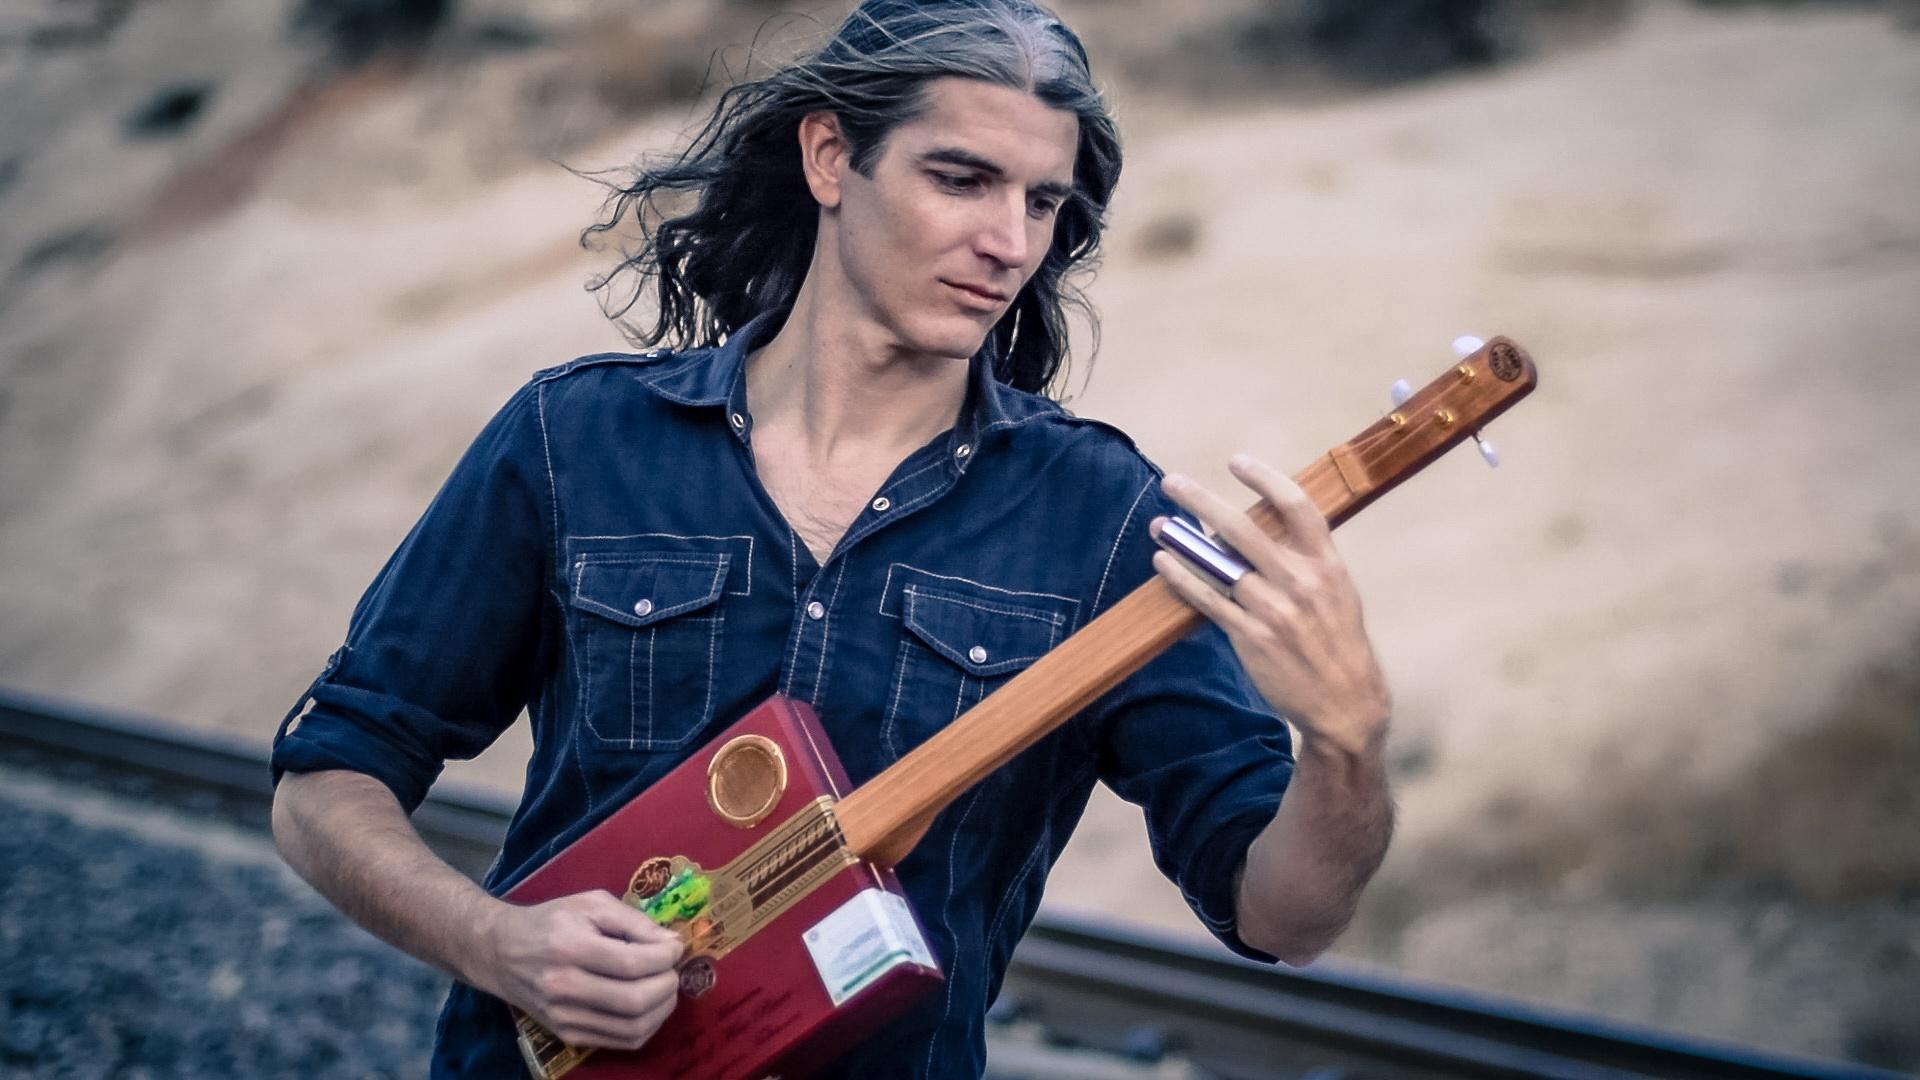 """Gypsy Fusion in Gm"" - Dan Mumm - Song, Guitar Tab and Backing Track 2017"